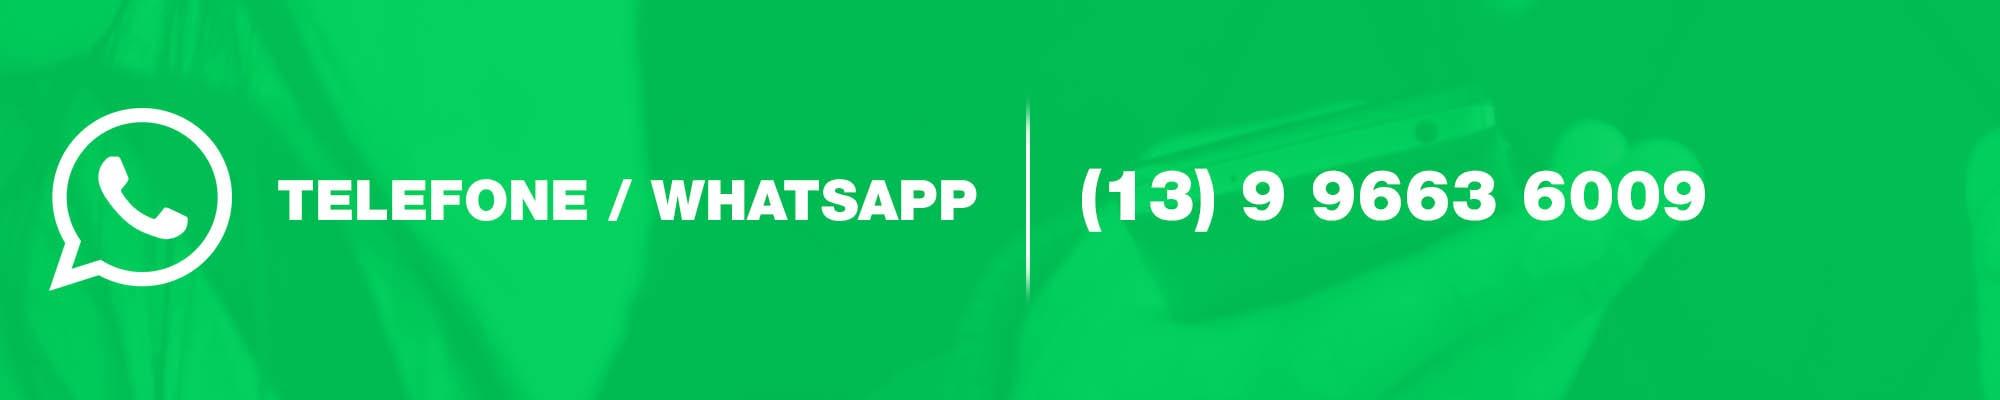 sv-baterias-telefone-e-whatsapp-v1